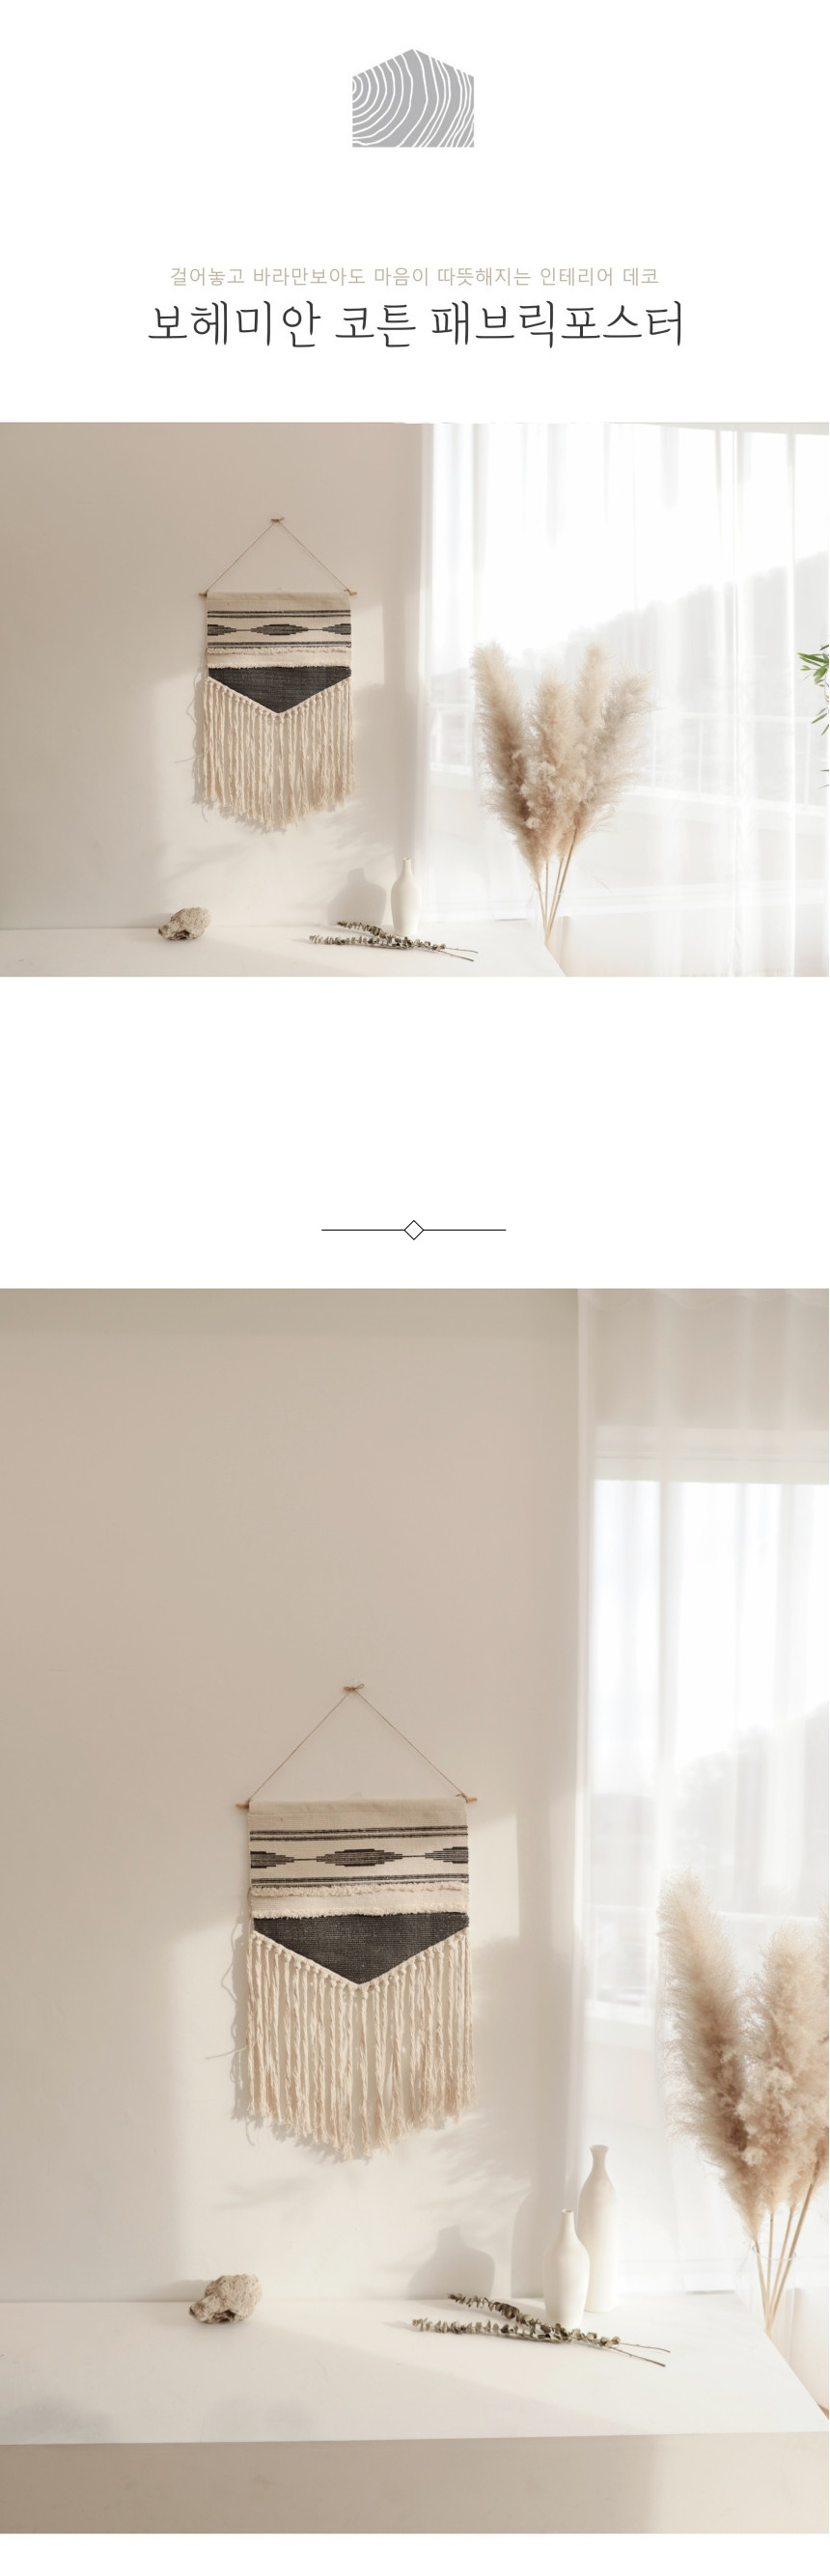 bohemian_cotton_fabricposter_01.jpg